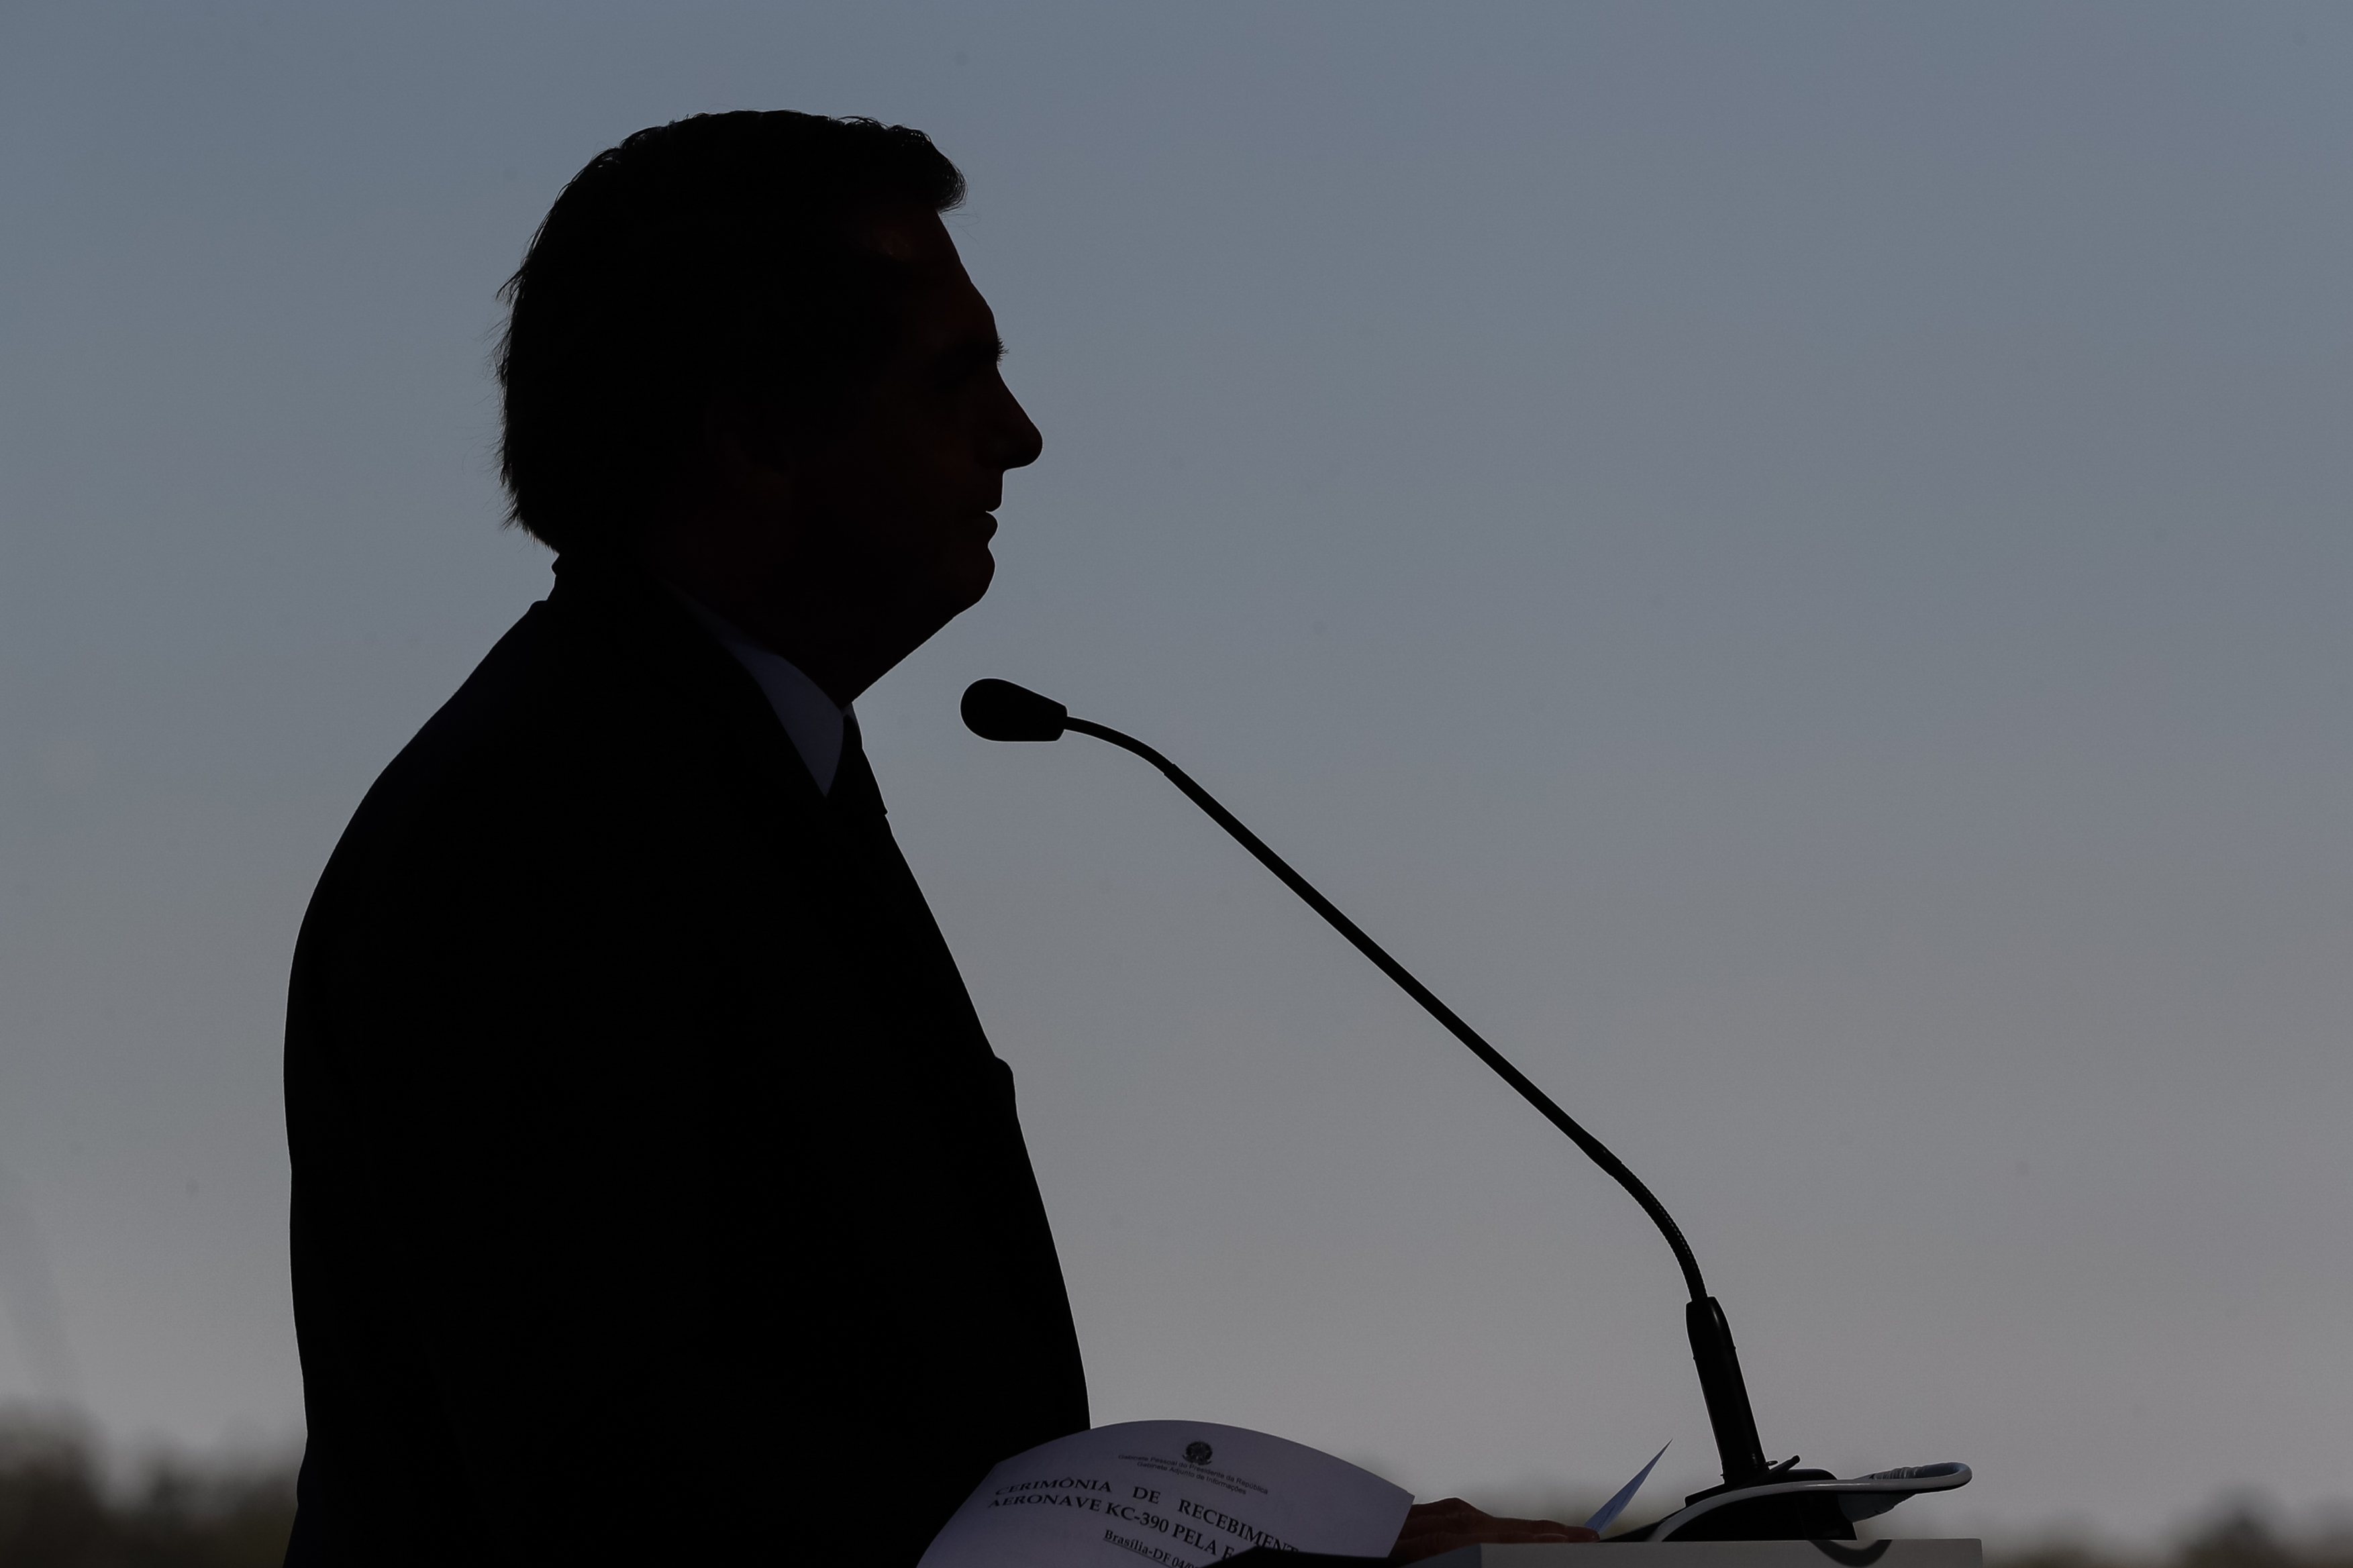 Entidade de juízes federais diz que Bolsonaro foi